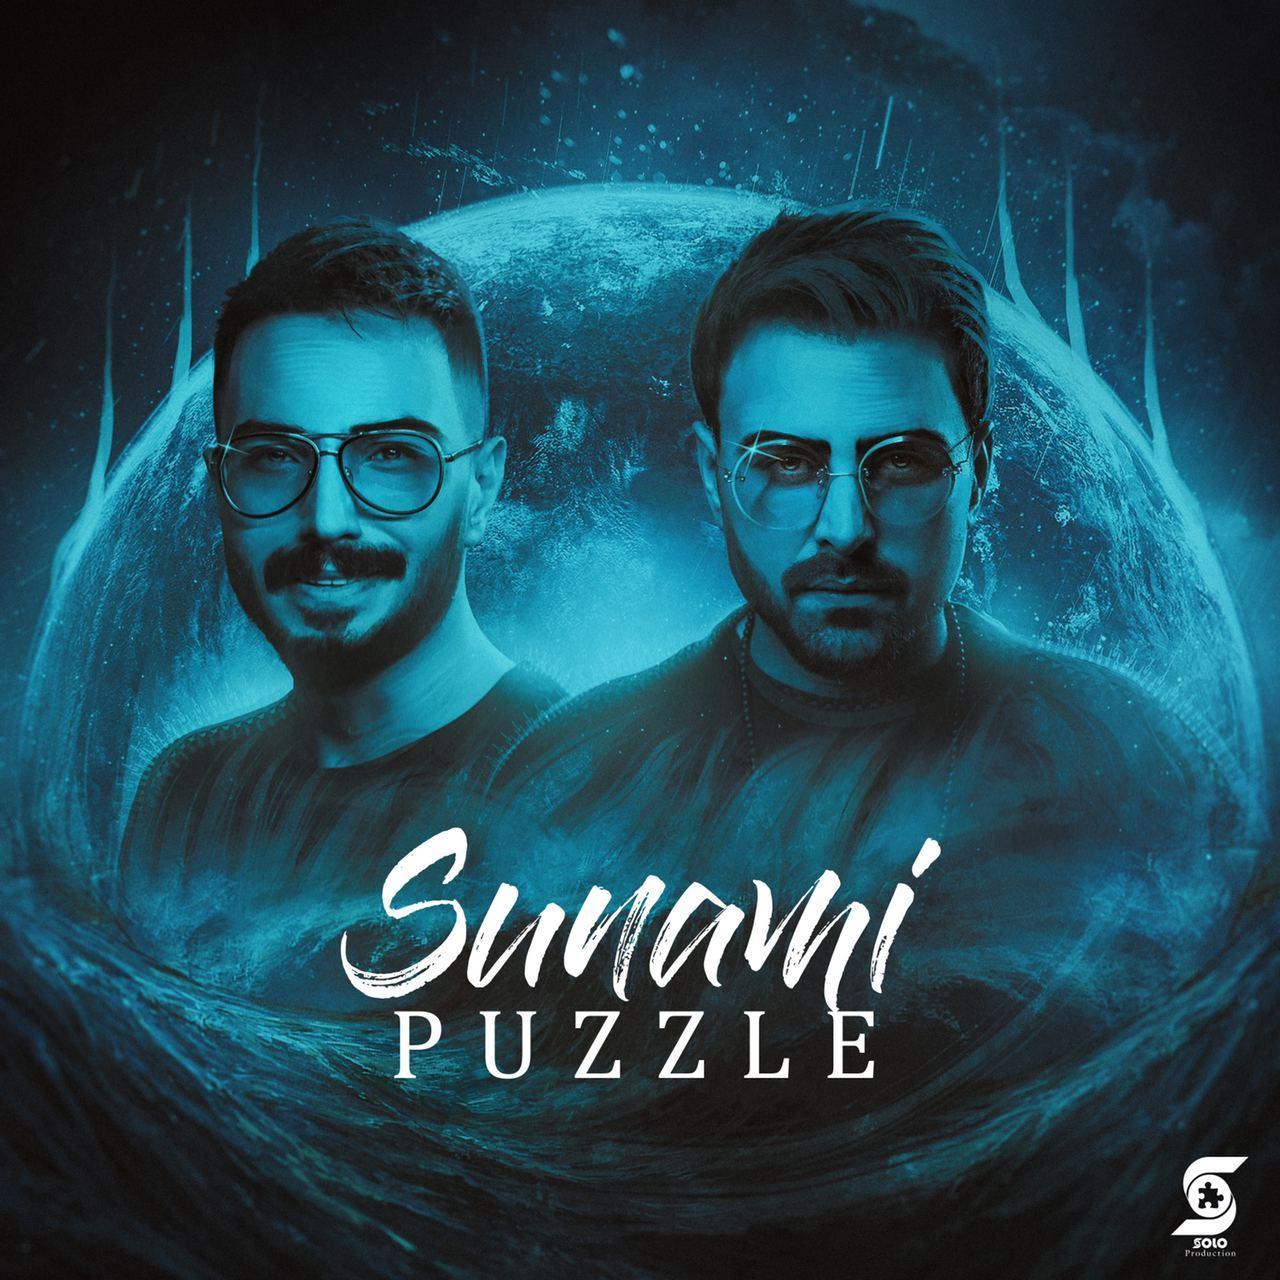 Puzzle Band – Sunami